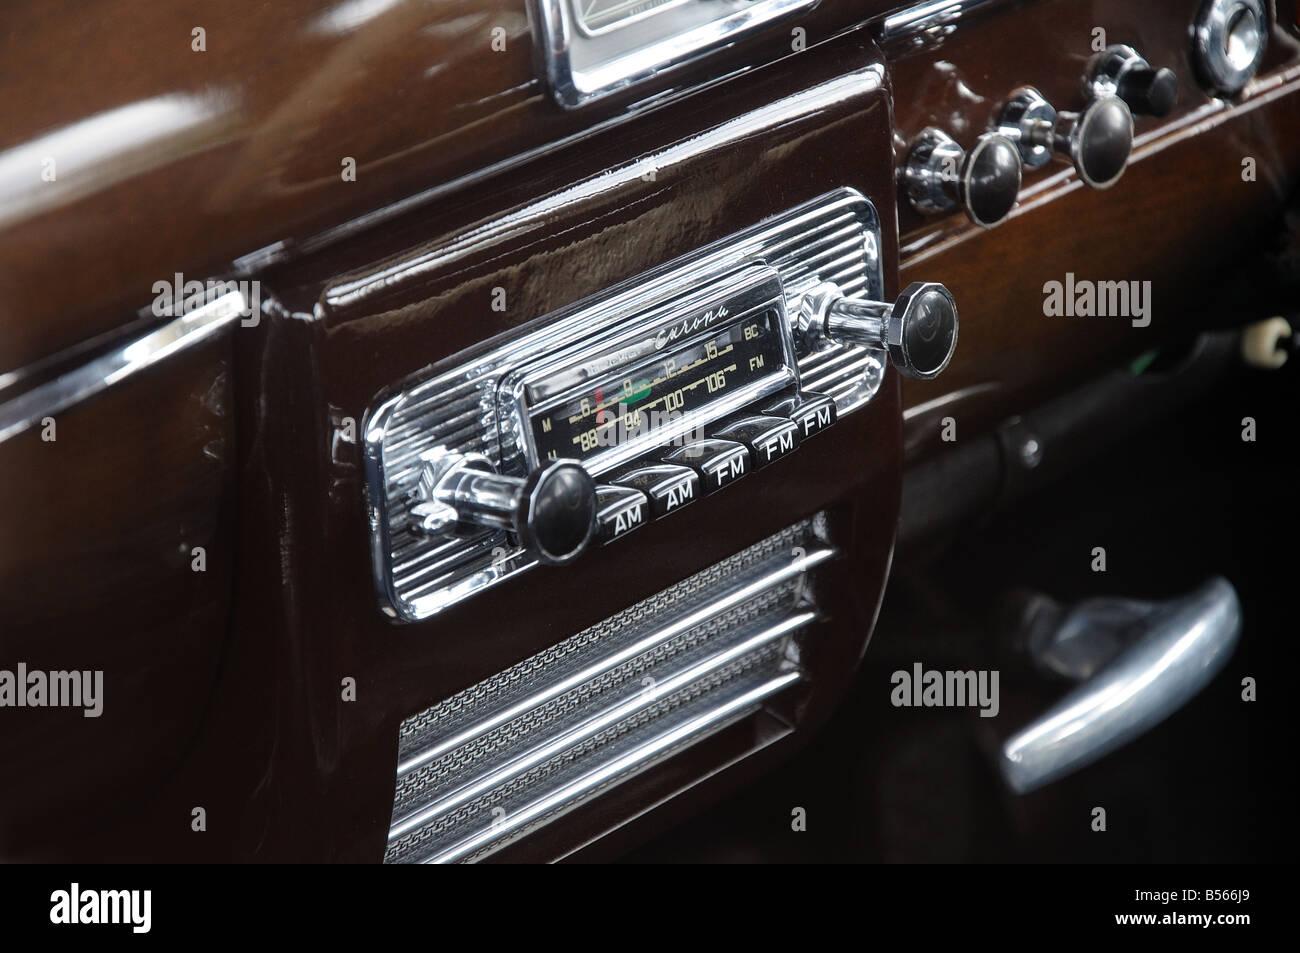 vintage car radio stock photos vintage car radio stock. Black Bedroom Furniture Sets. Home Design Ideas